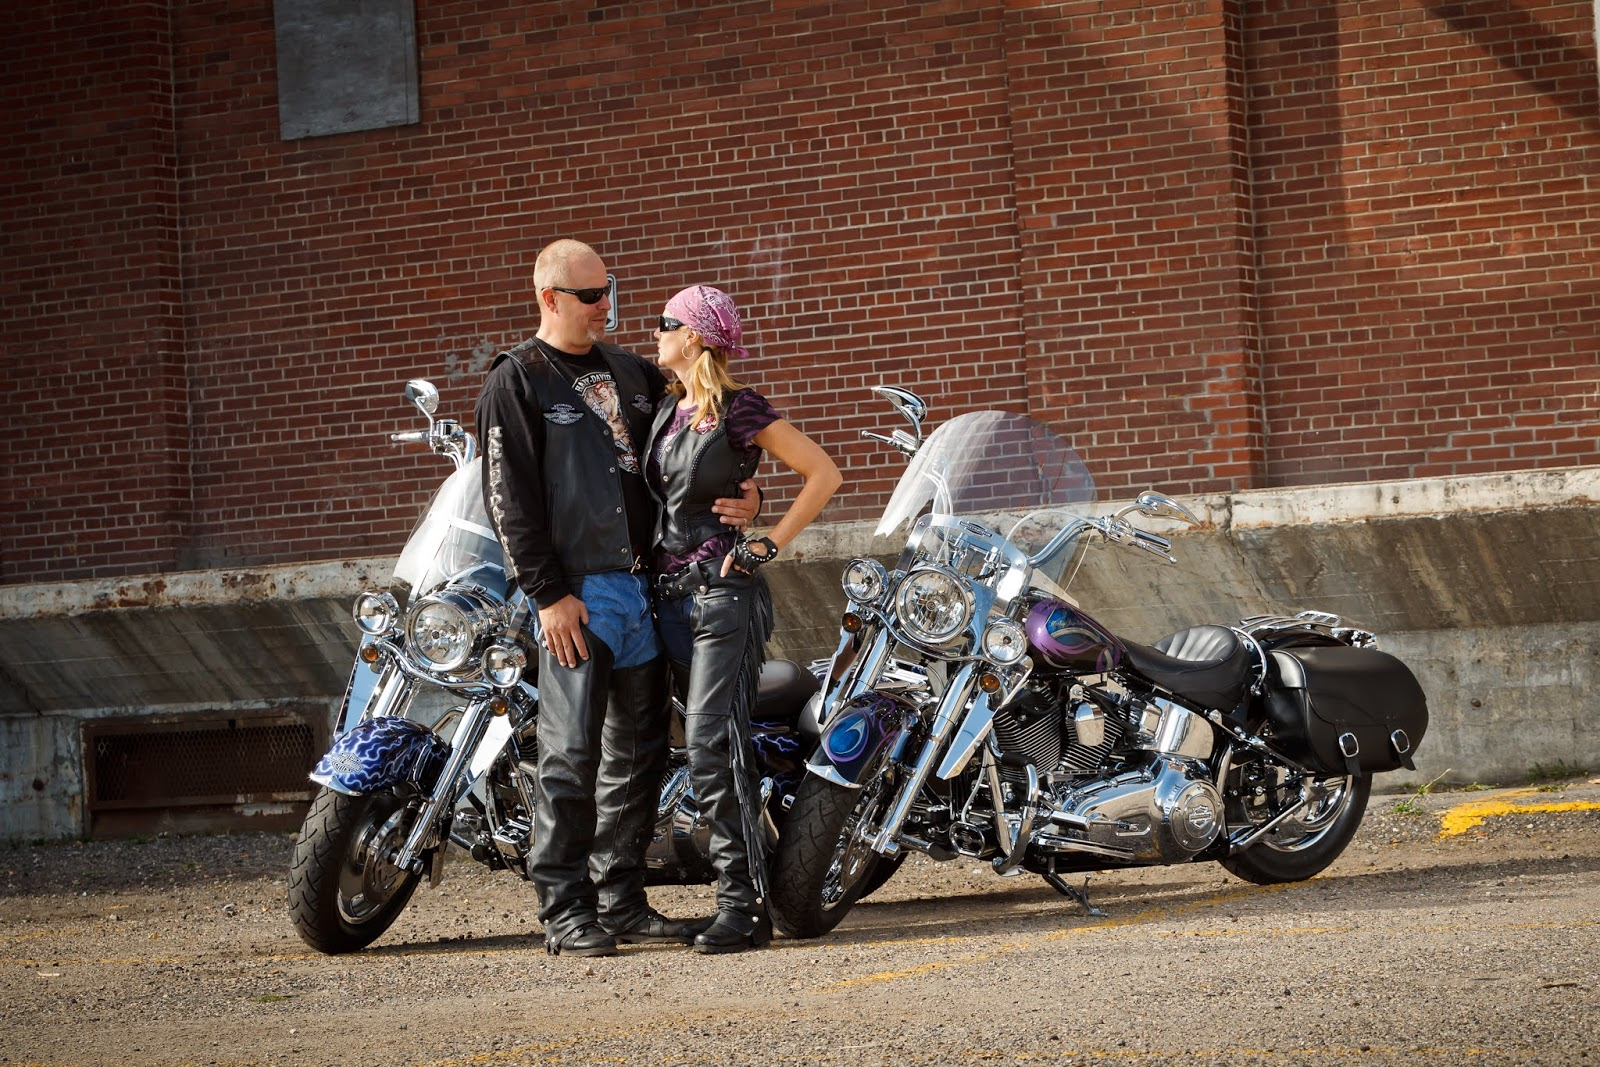 dating harley riders